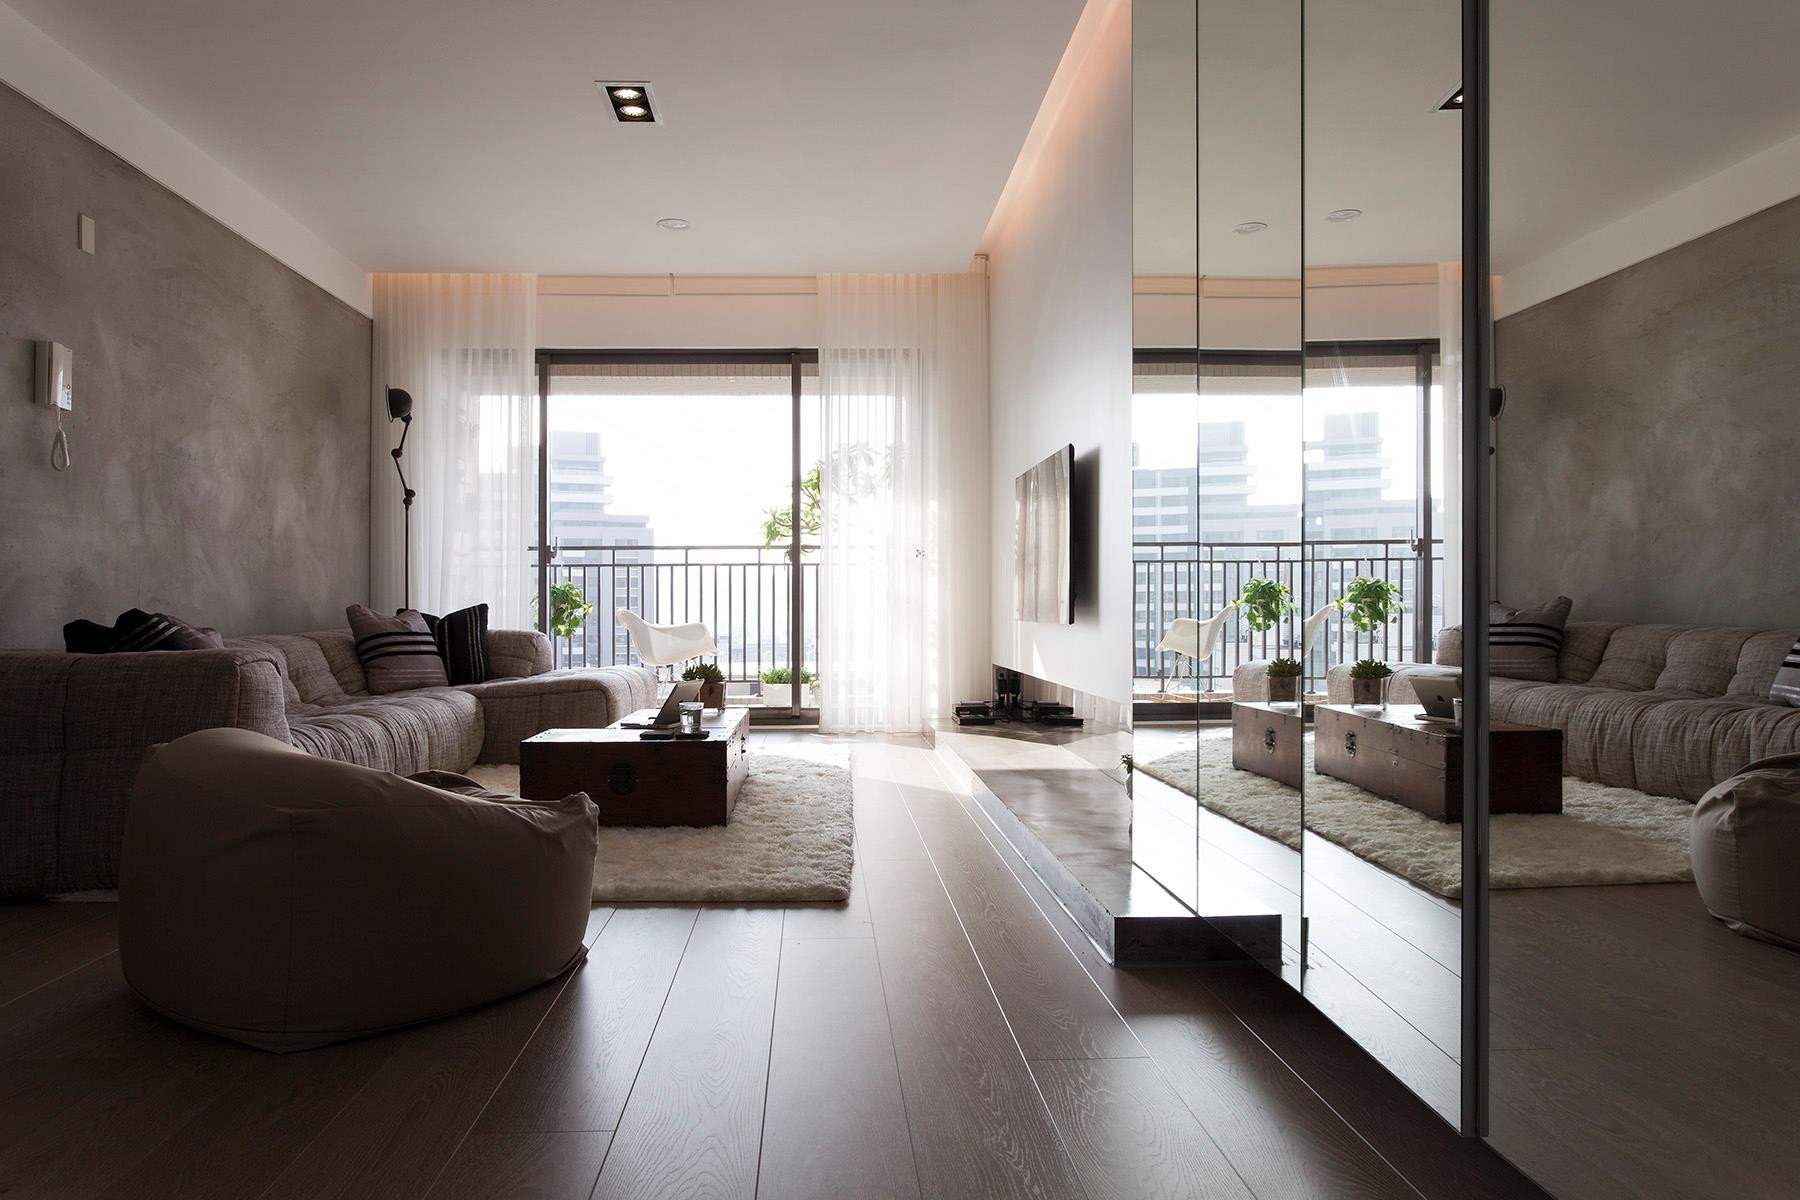 Comfortable Living Room Minimalist Fresh fortable Contemporary Decor